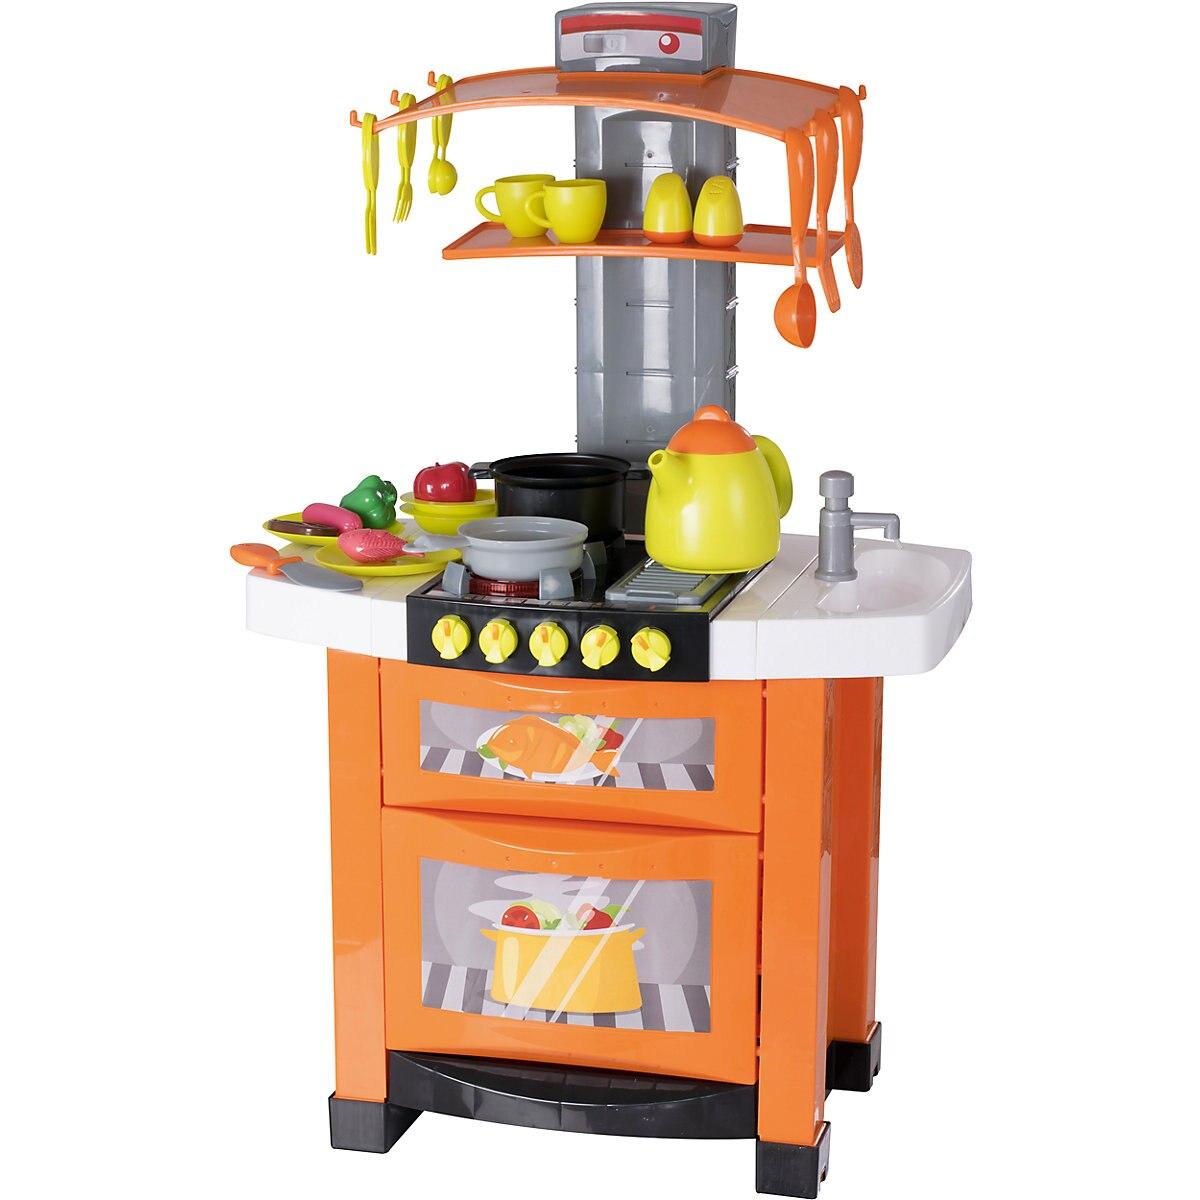 HTI Kitchen Toys7441696 Girls Vegetables Food Mini Tableware Game Play Toy Boy Girl MTpromo